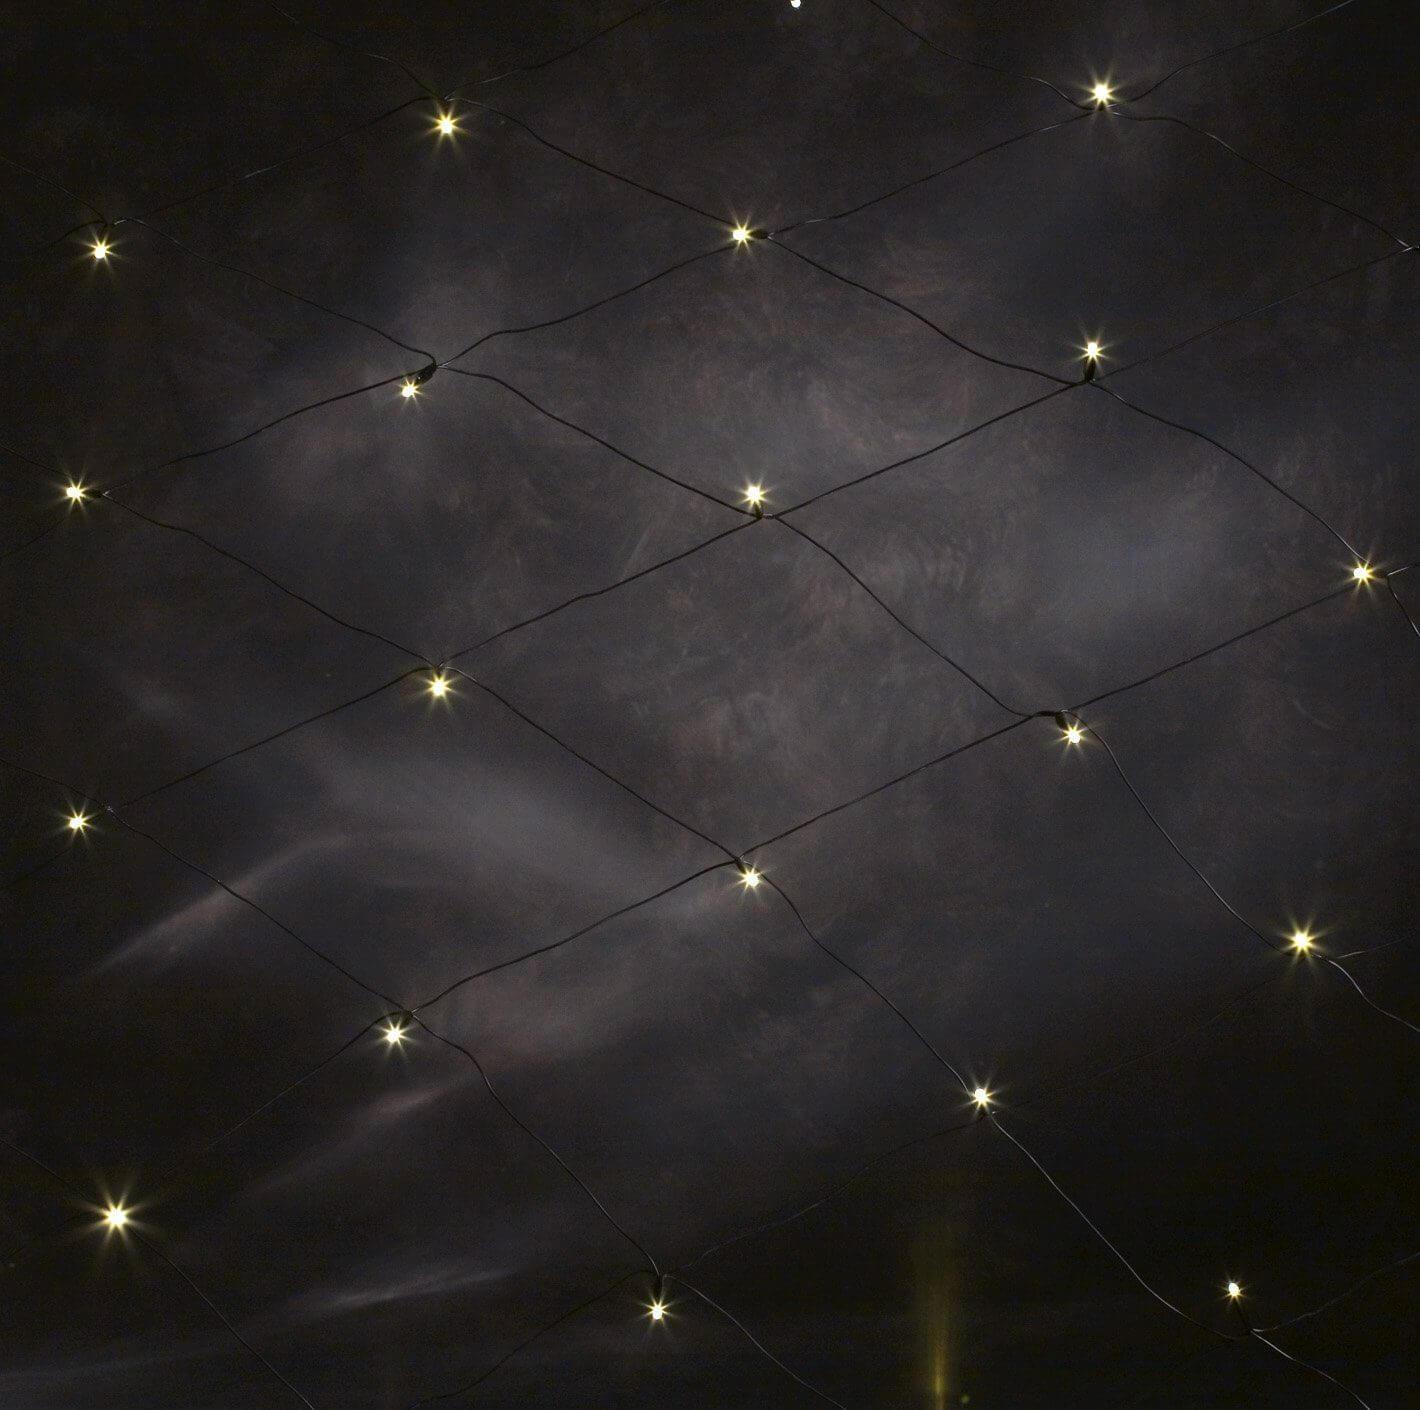 Konstsmide  3748-100 LED-Lichter-Netz 1x1m 32 LEDs warmweiß